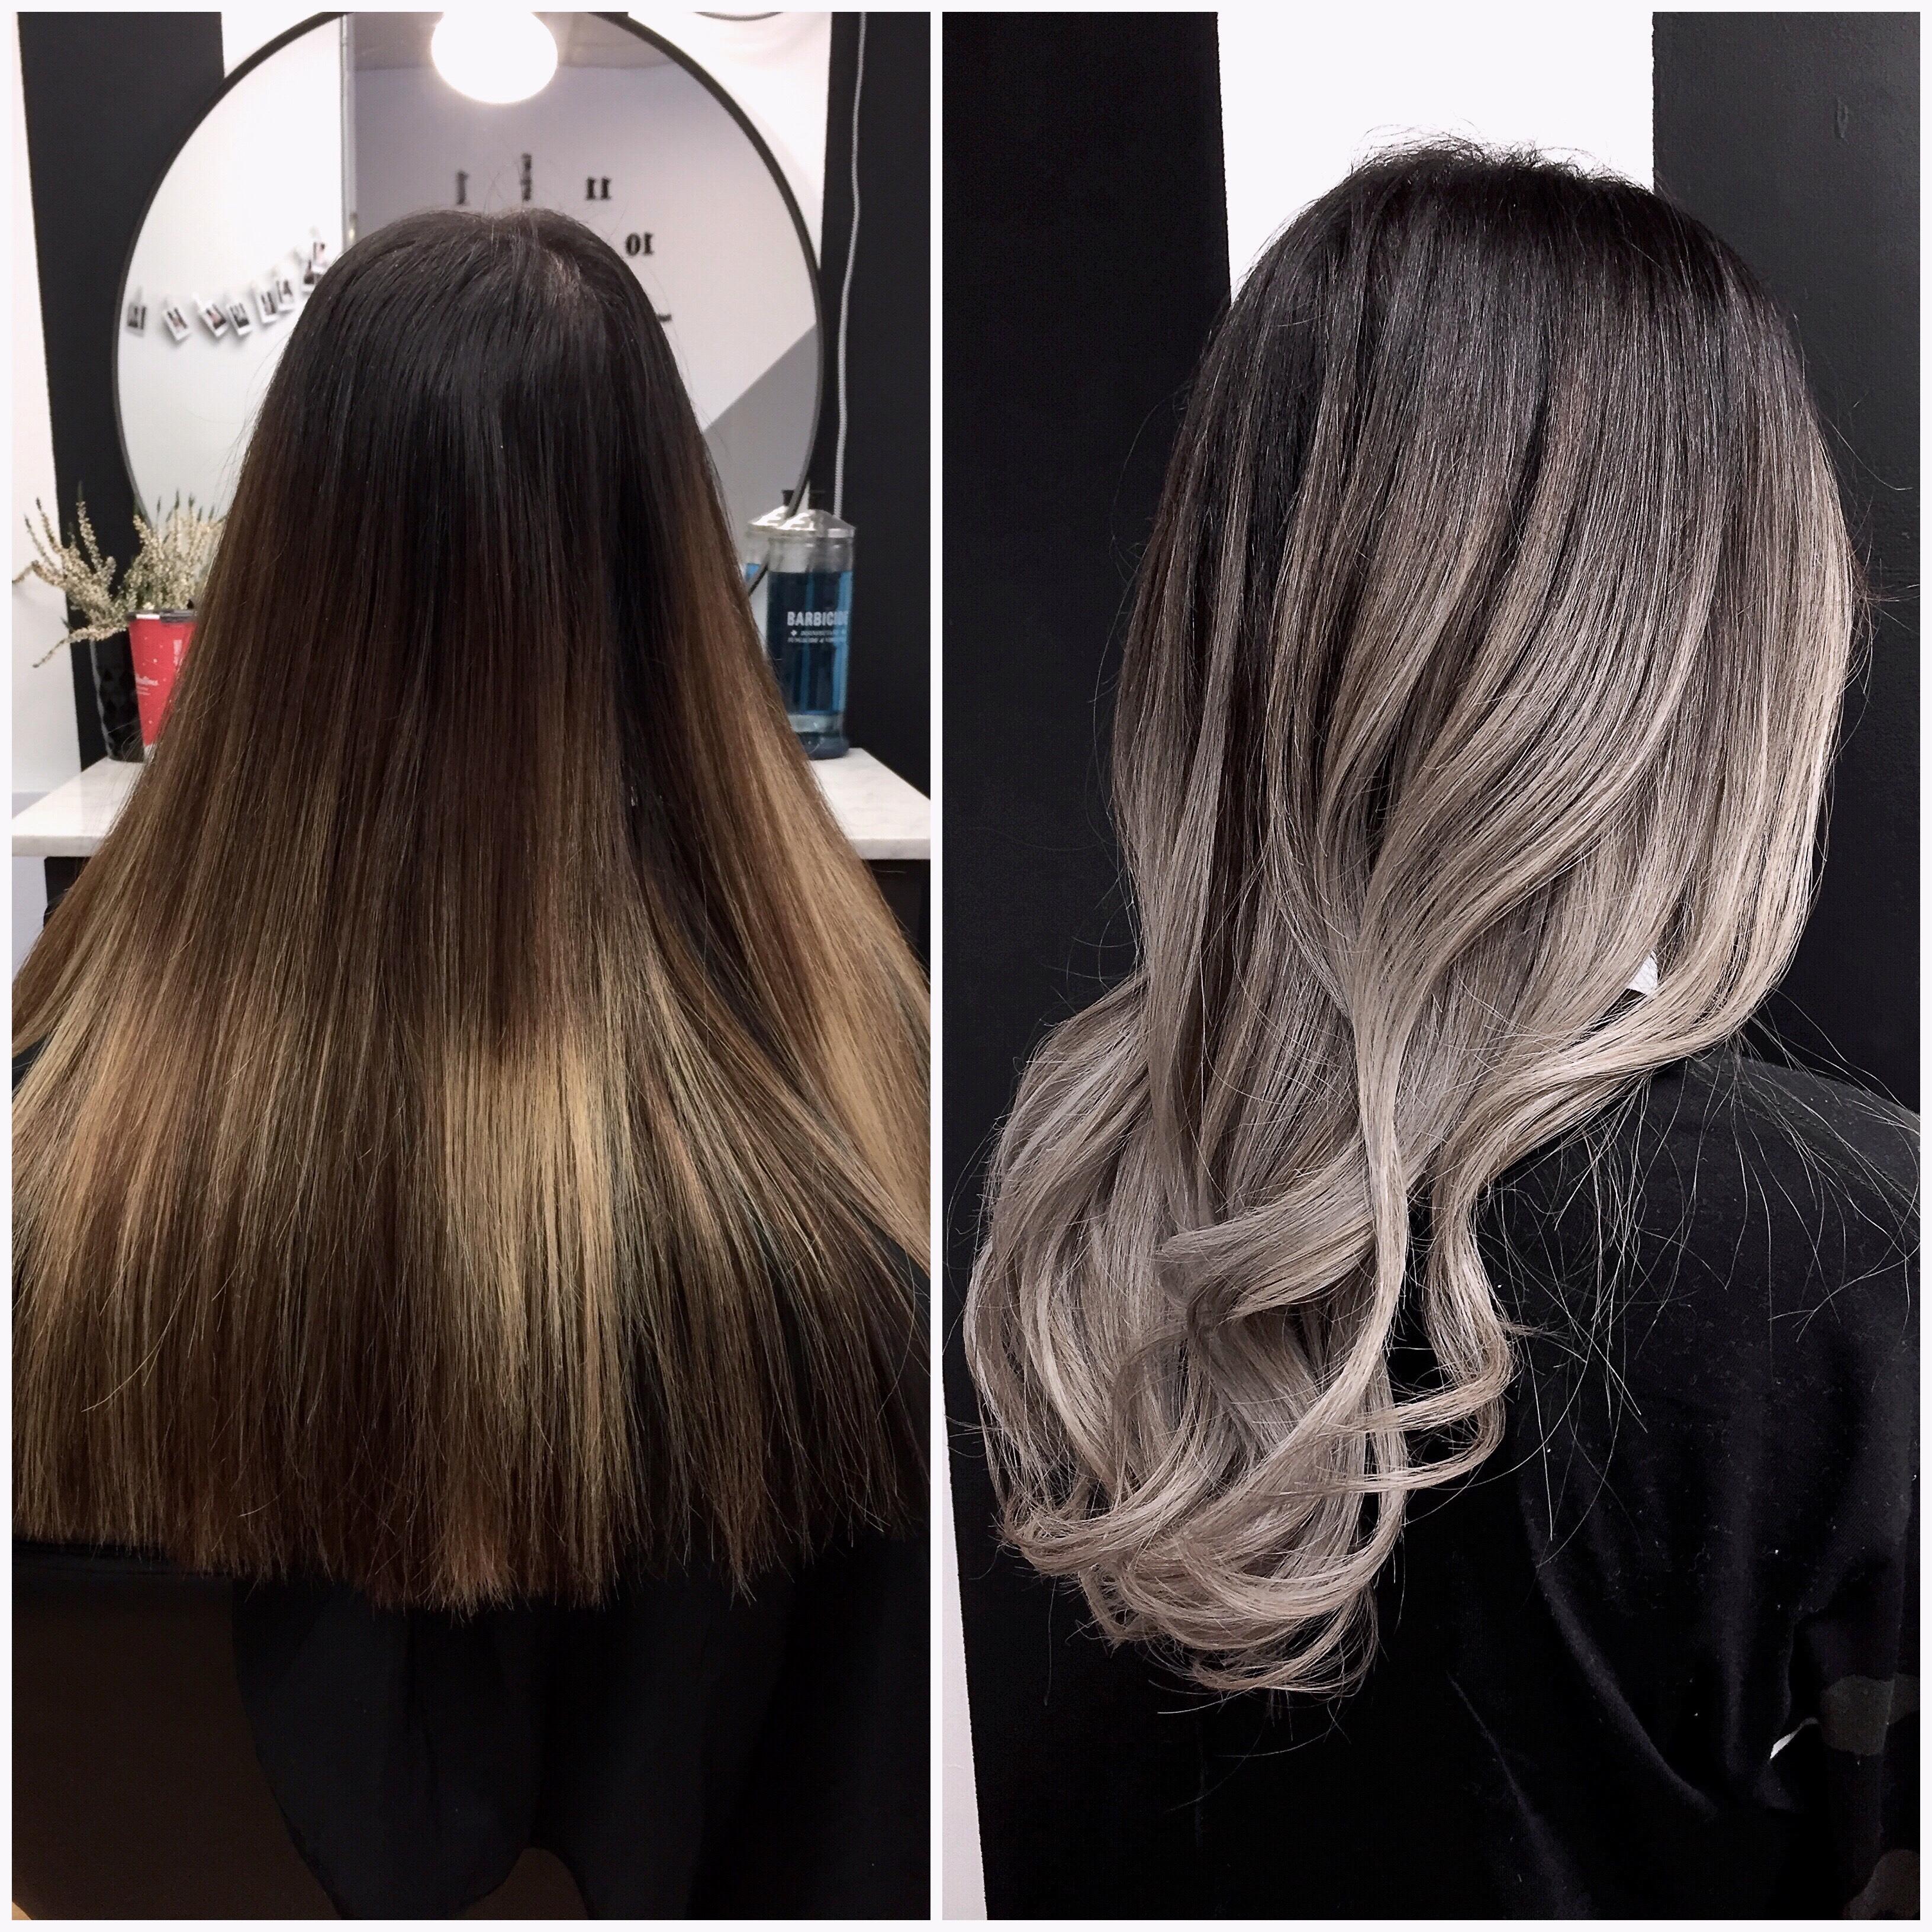 Hair color makeover by Nicole Graftner (@hairbynicoleg)